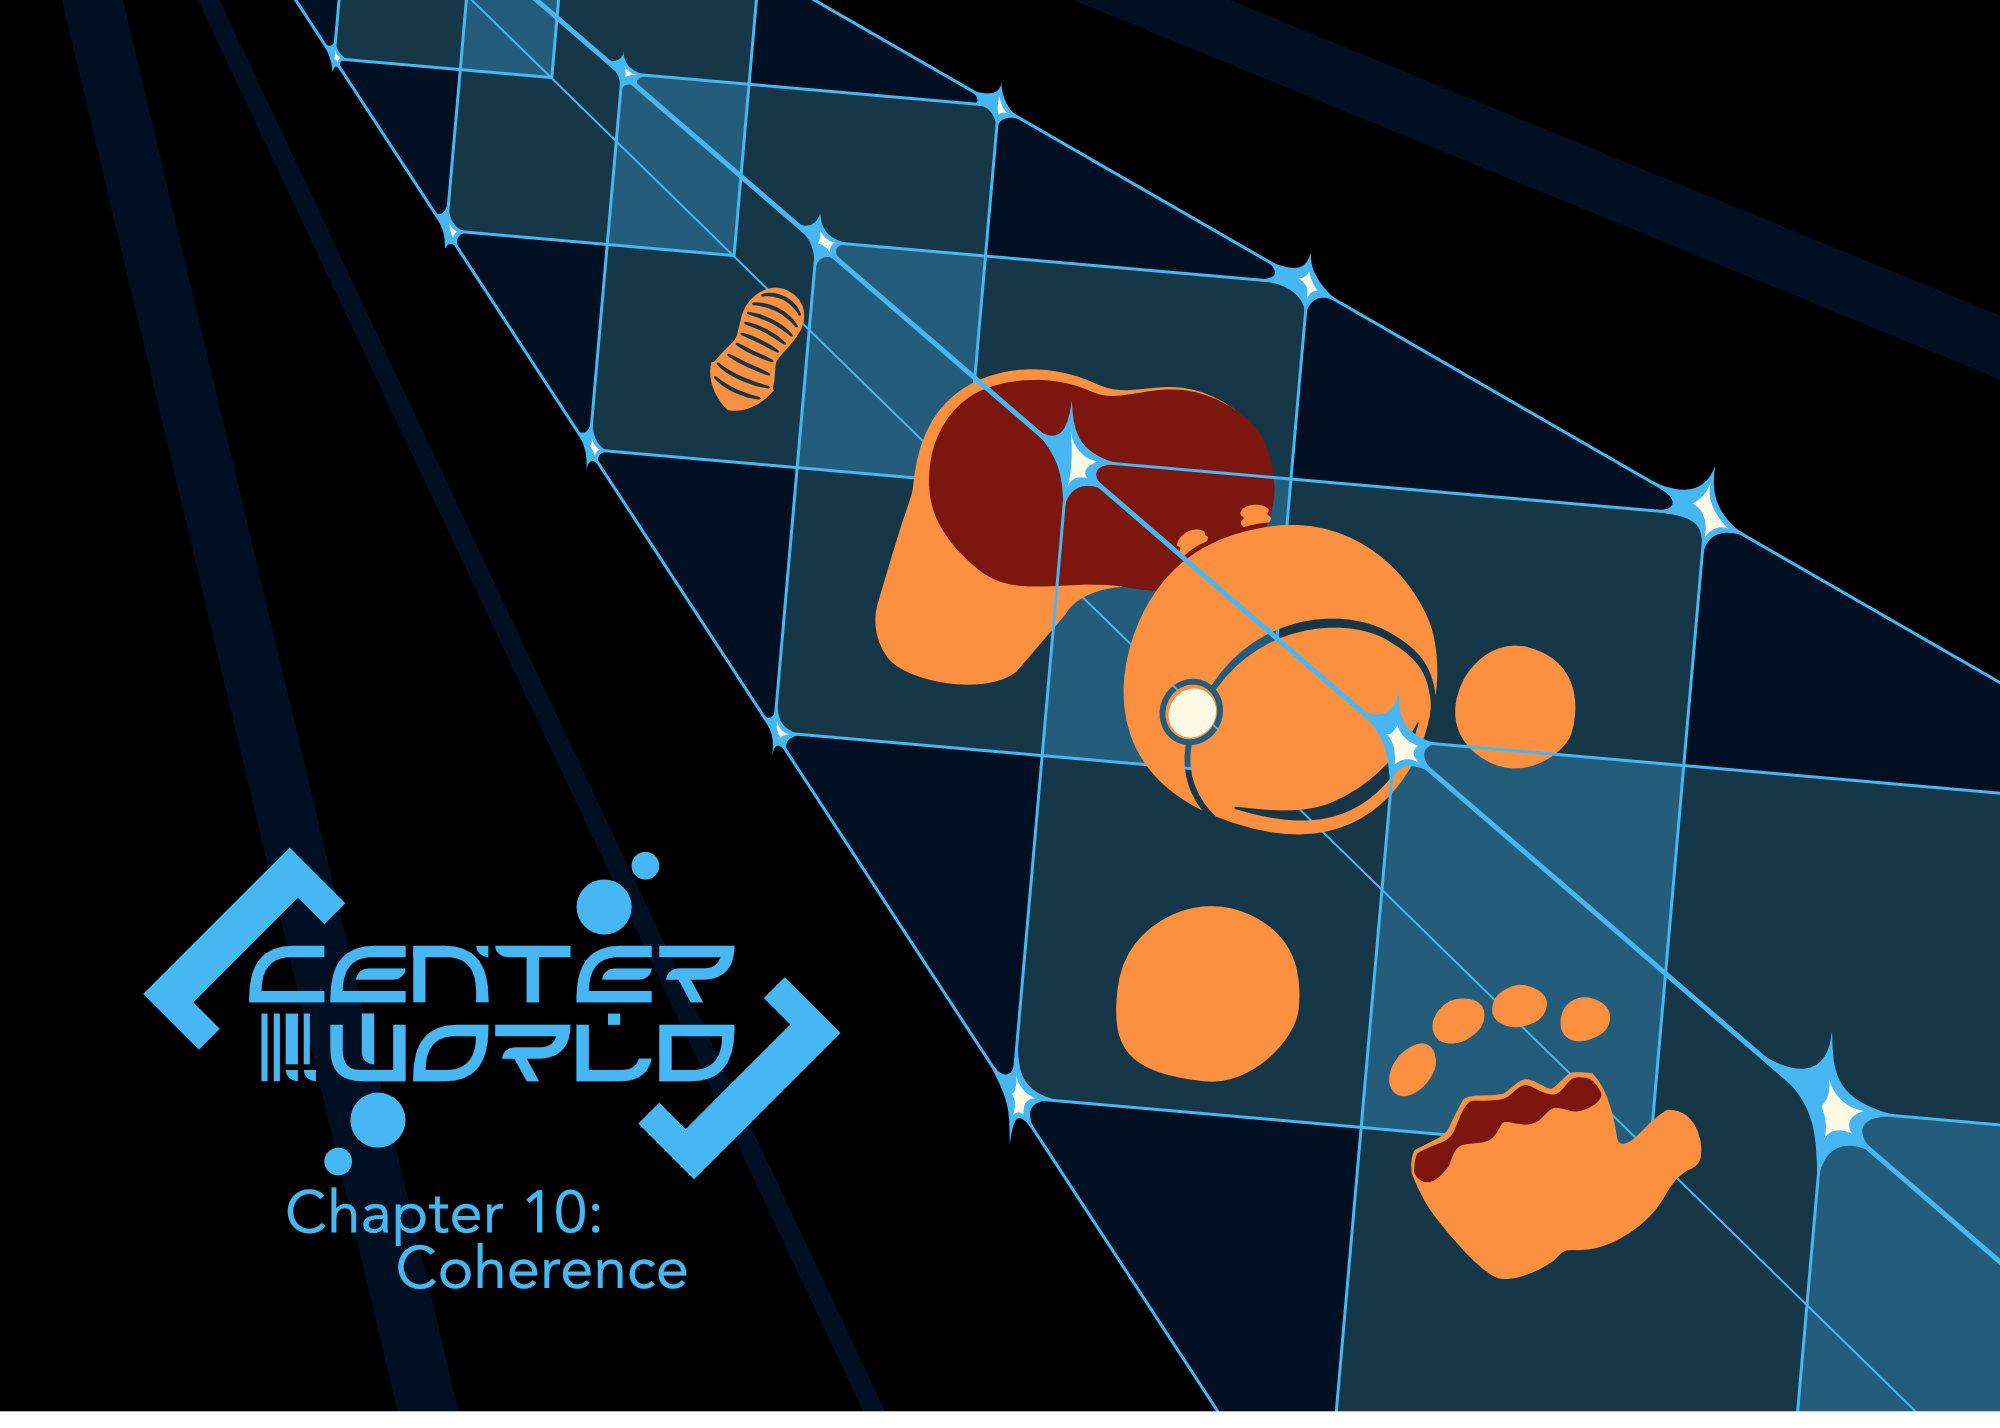 Center World 10.0